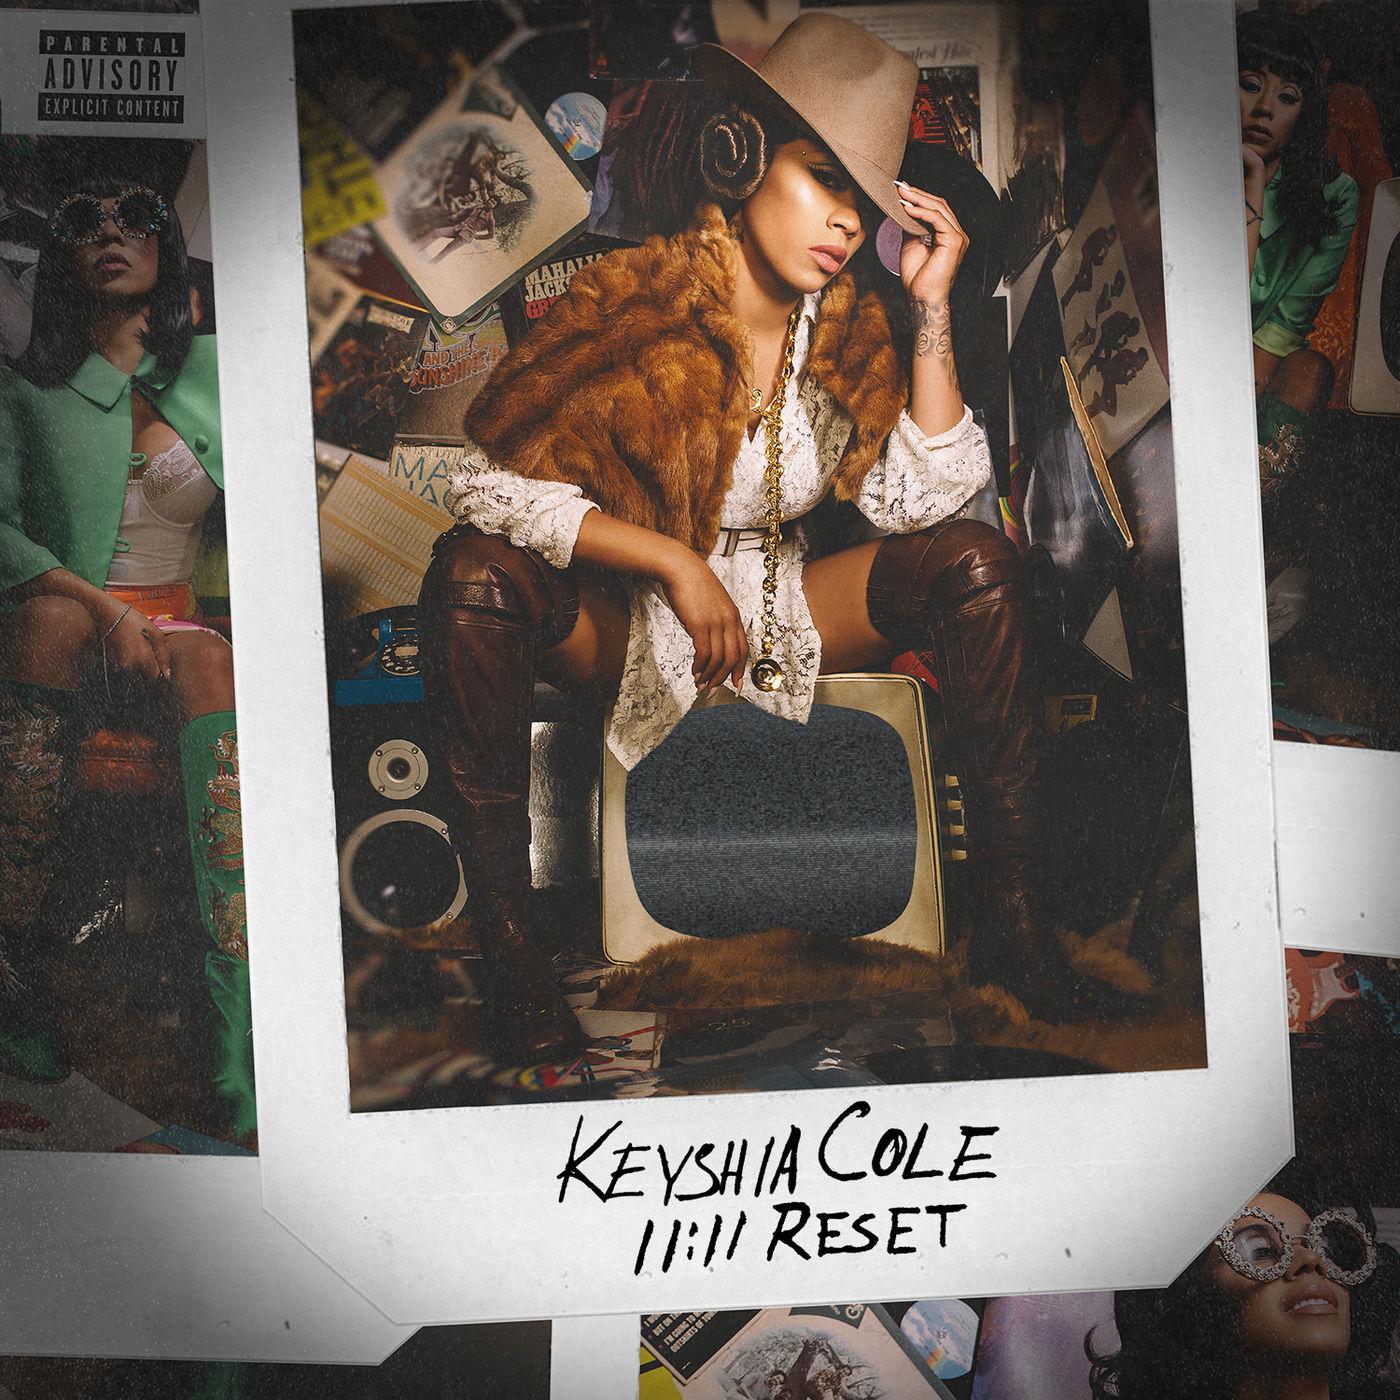 Keyshia Cole – 1111 Reset